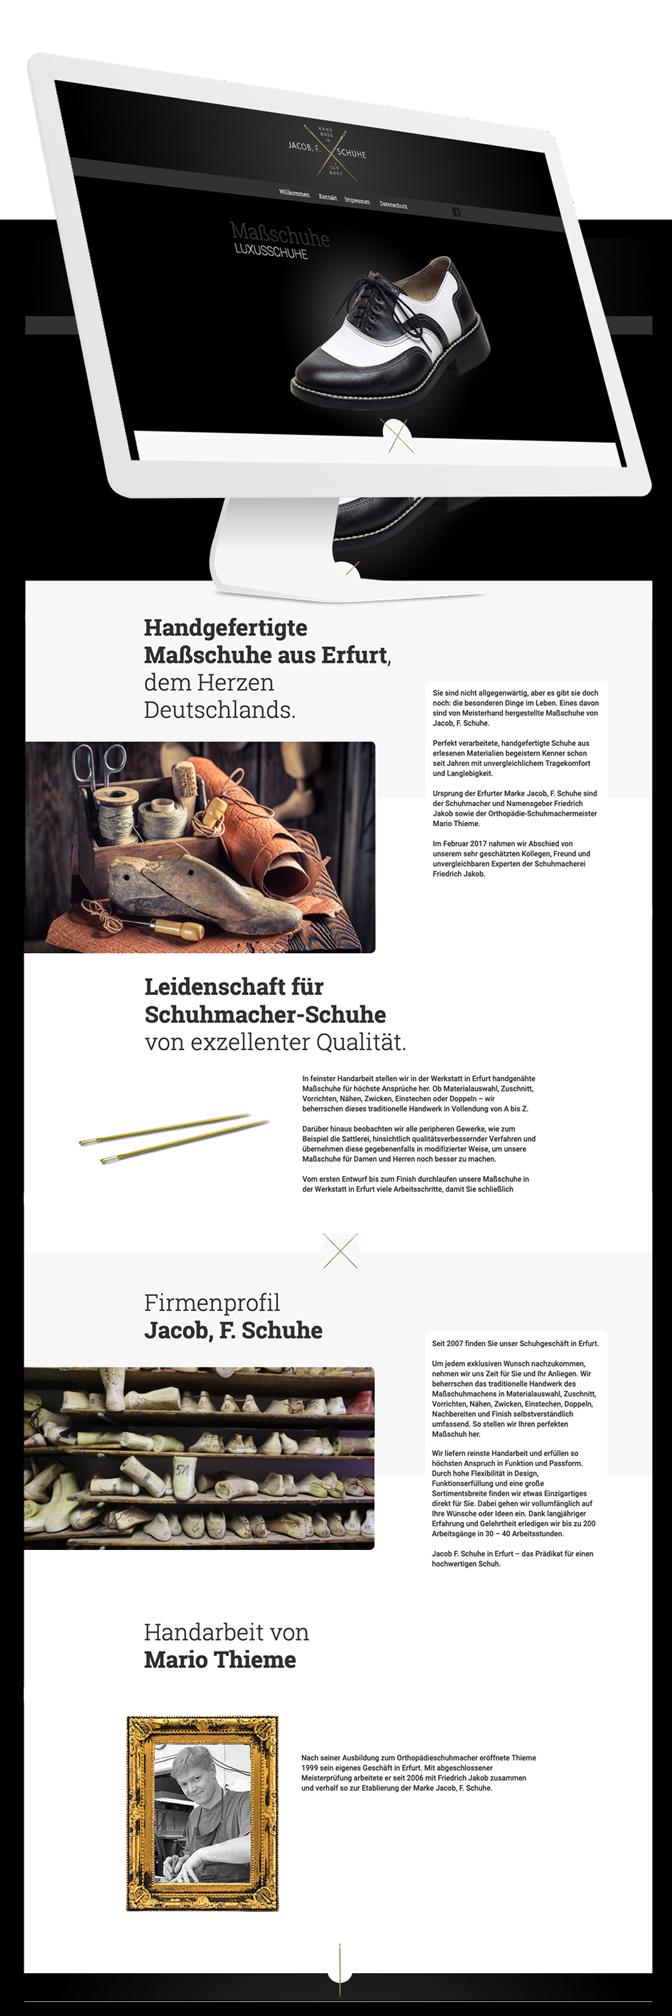 Samt&Seidel_Referenz_Jacob F Schuhe_Design_02